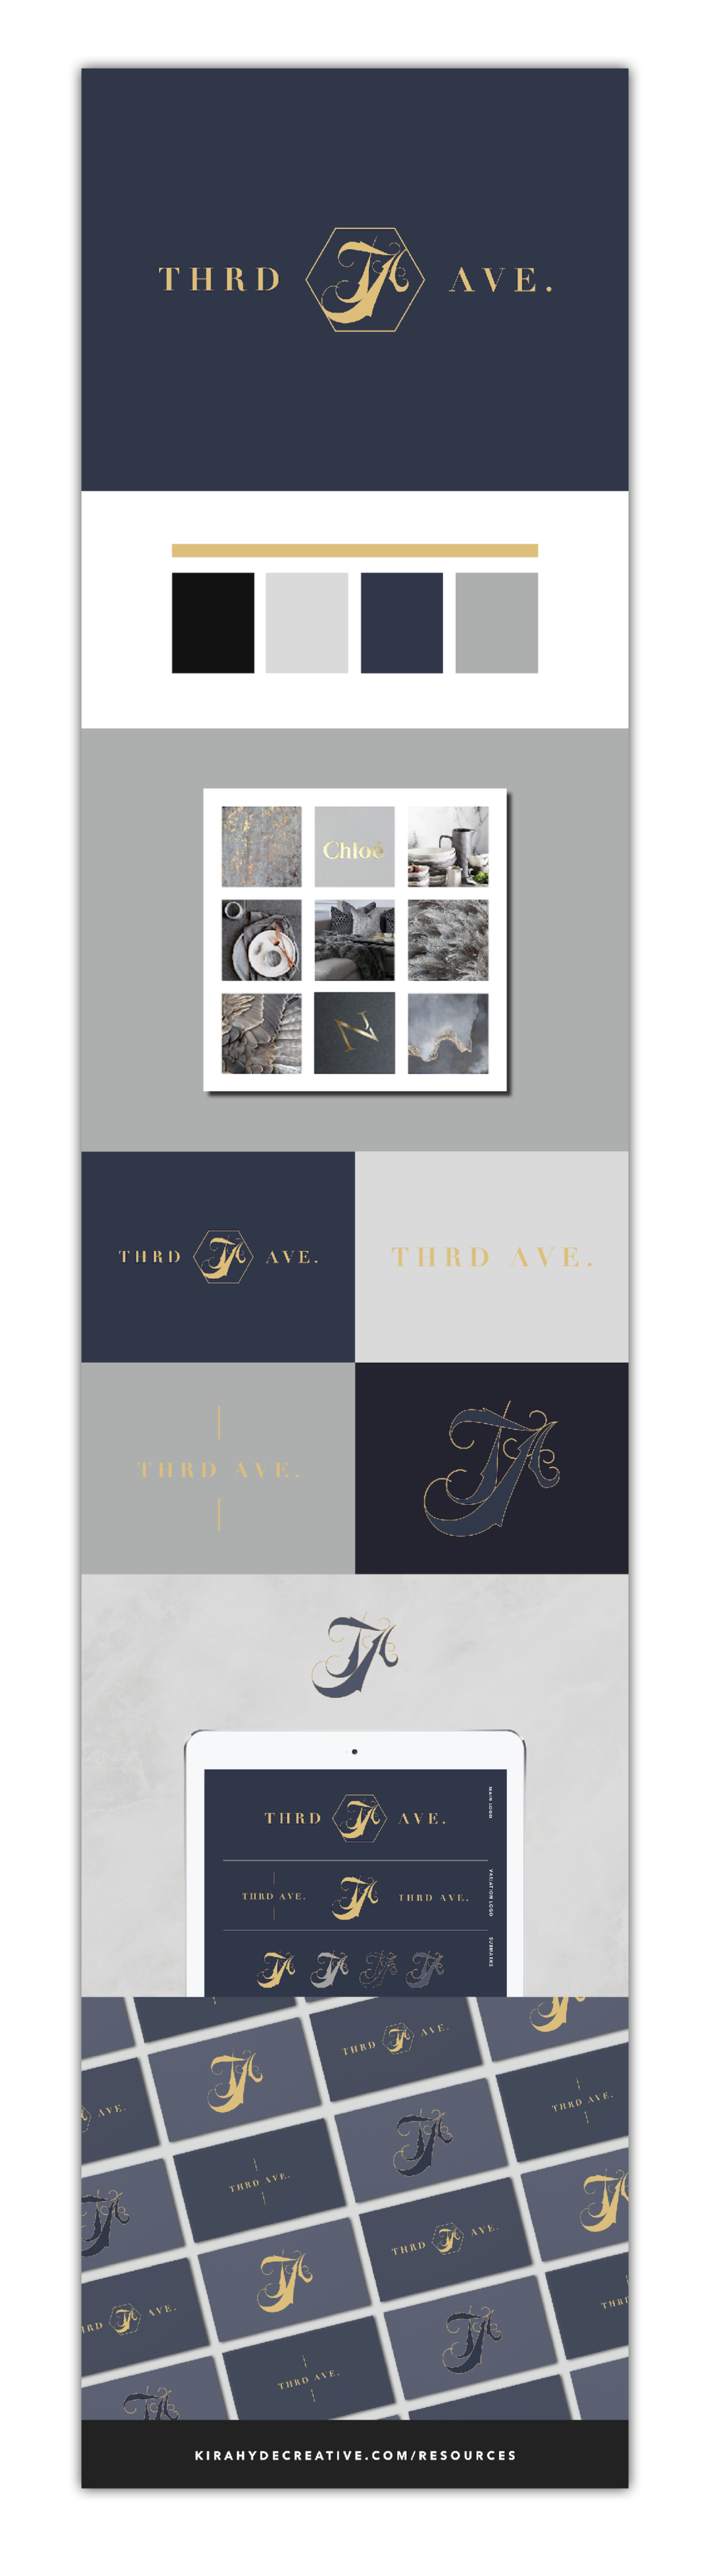 Third Avenue - Kira Hyde Creative